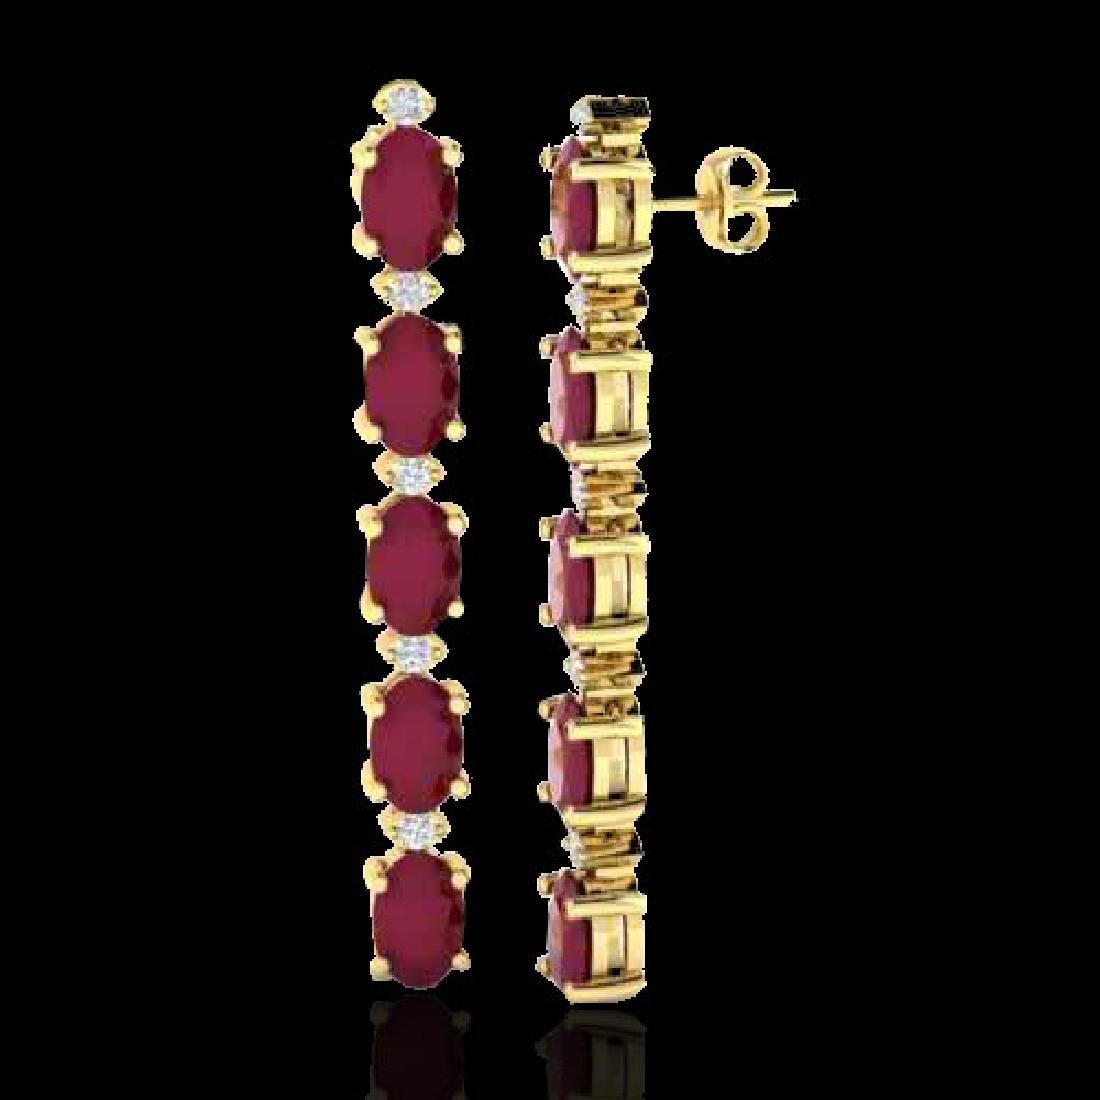 7 CTW Ruby & VS/SI Diamond Tennis Earrings 10K Yellow - 2